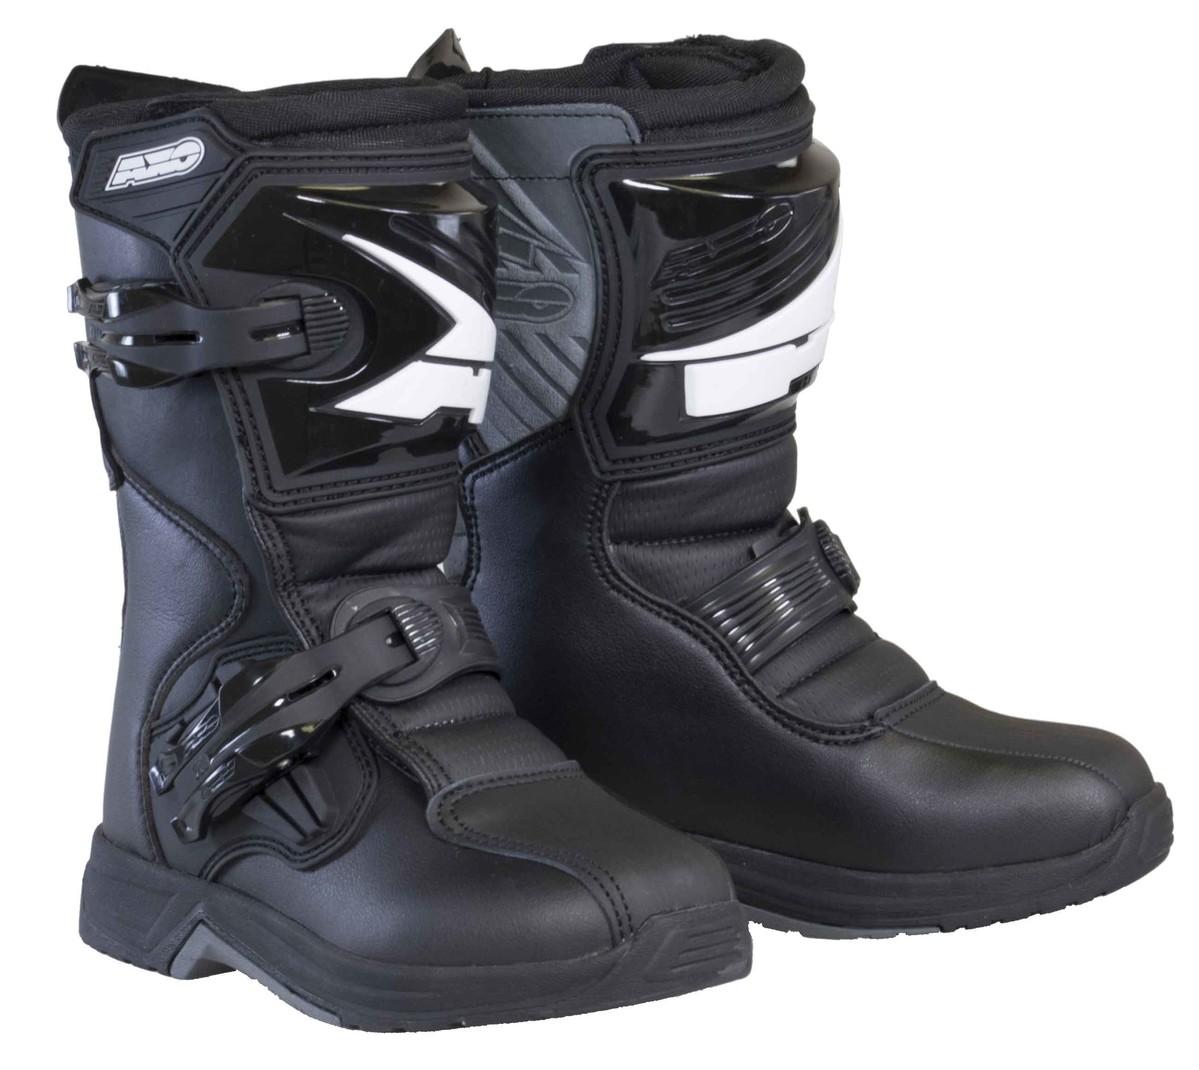 AXO PeeWee Drone Black Boots